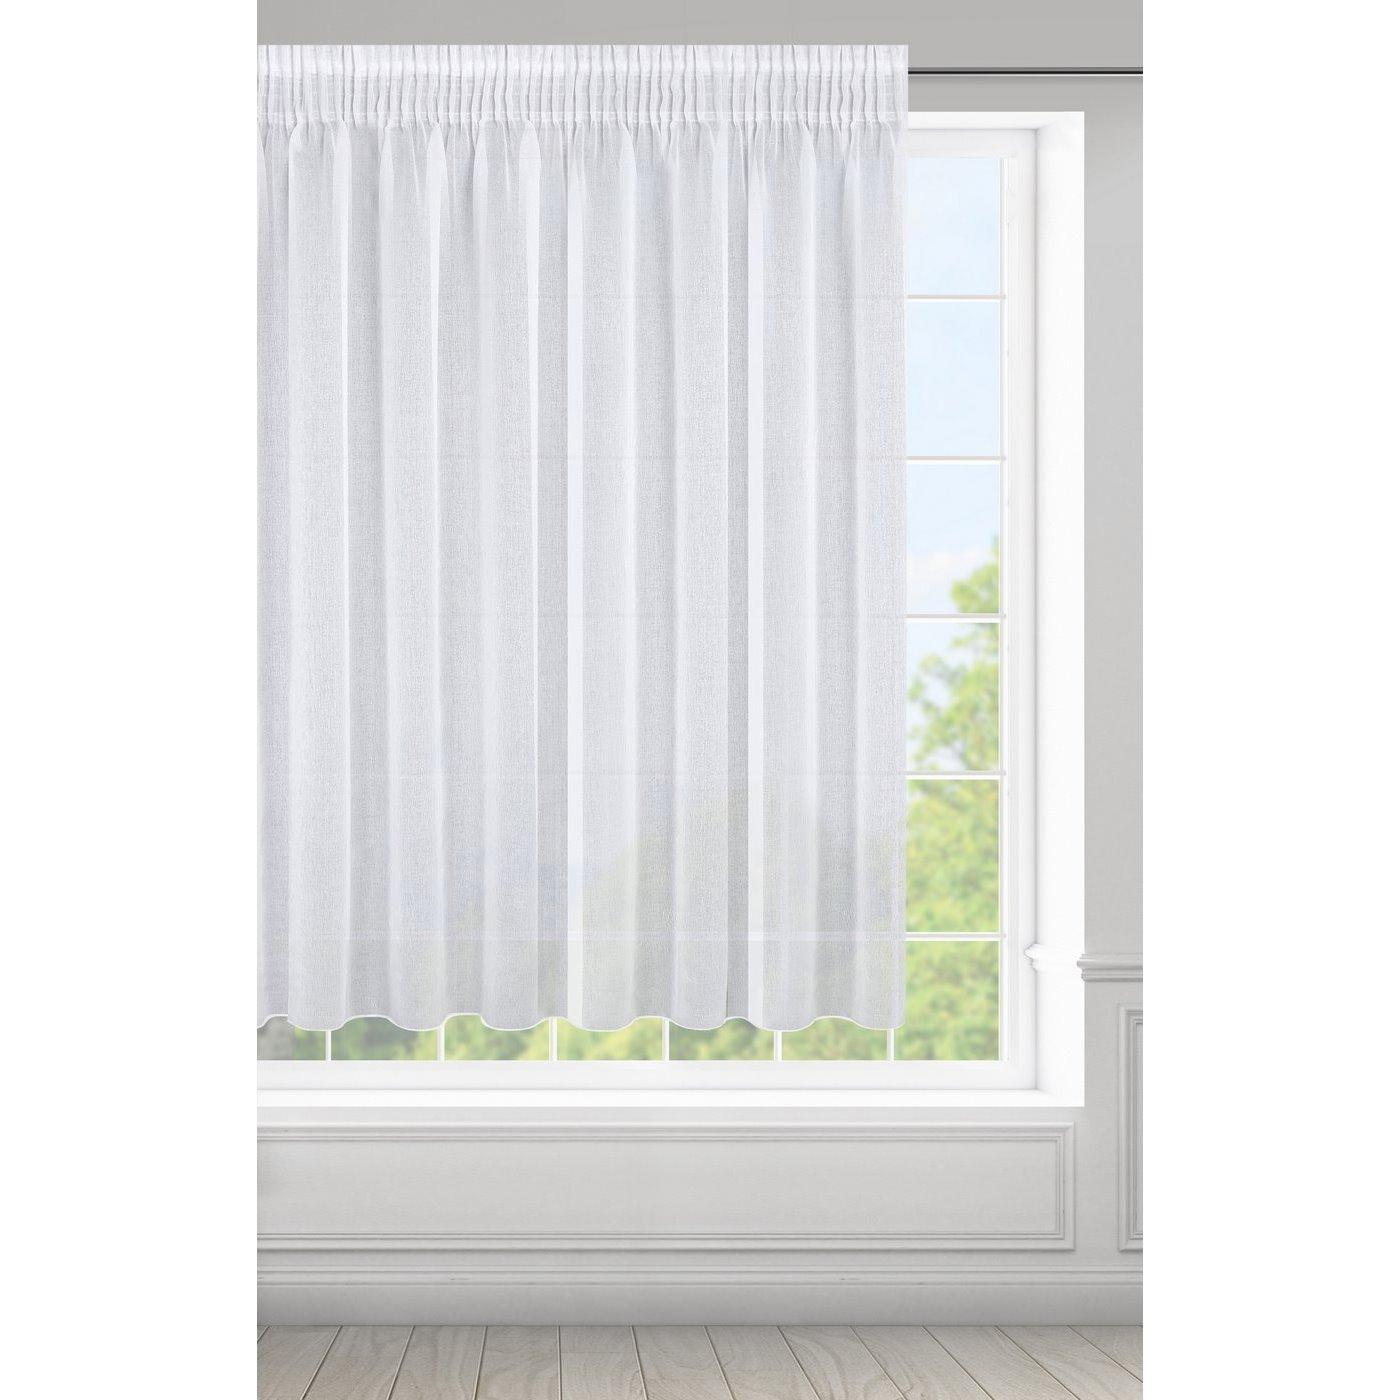 Záclona ELPIDIA na páske biela 350x150cm